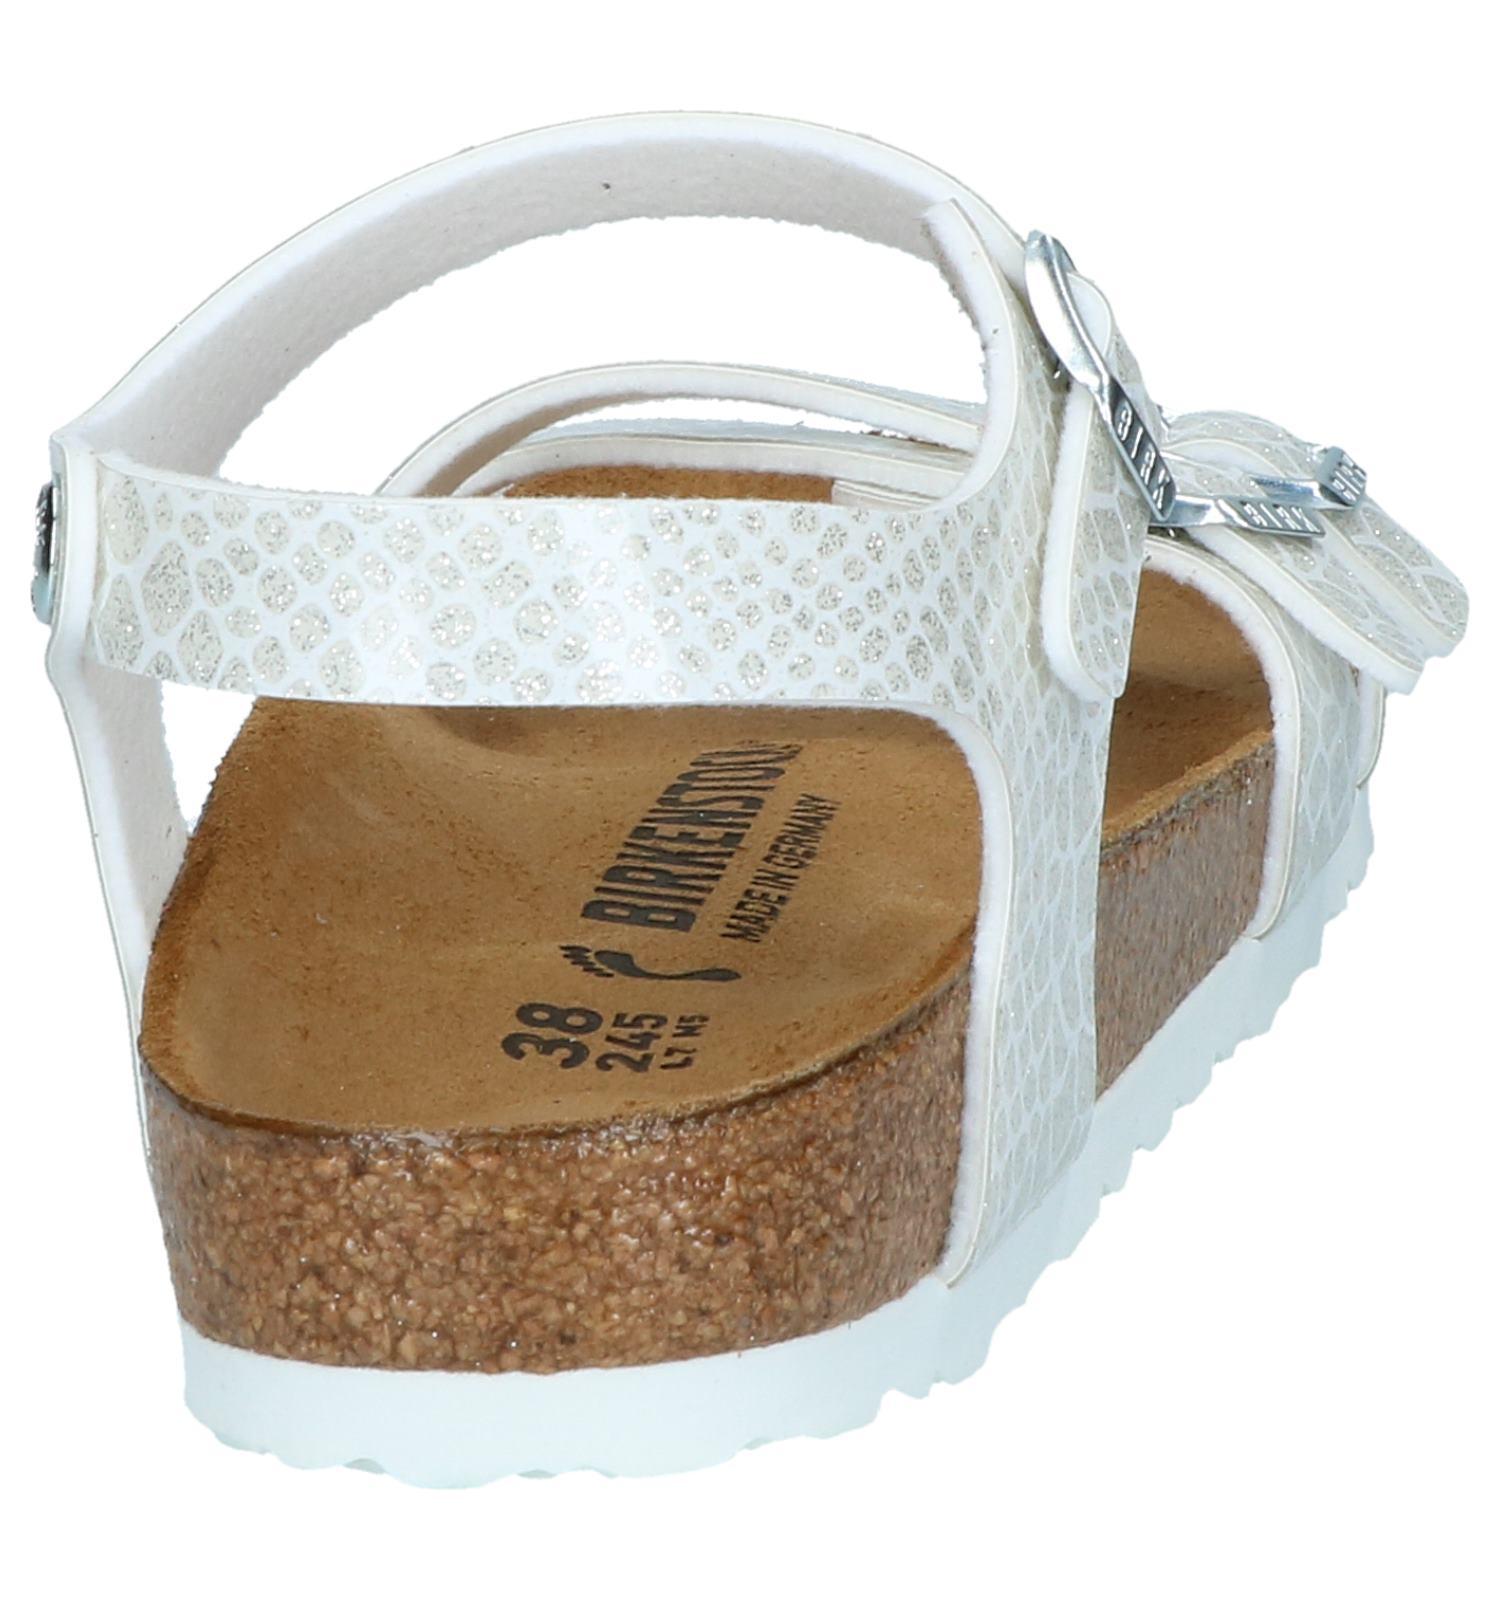 Witte Sandalen Kumba Kumba Witte Birkenstock Birkenstock Birkenstock Witte Sandalen Witte Sandalen Sandalen Kumba bfy6Y7g